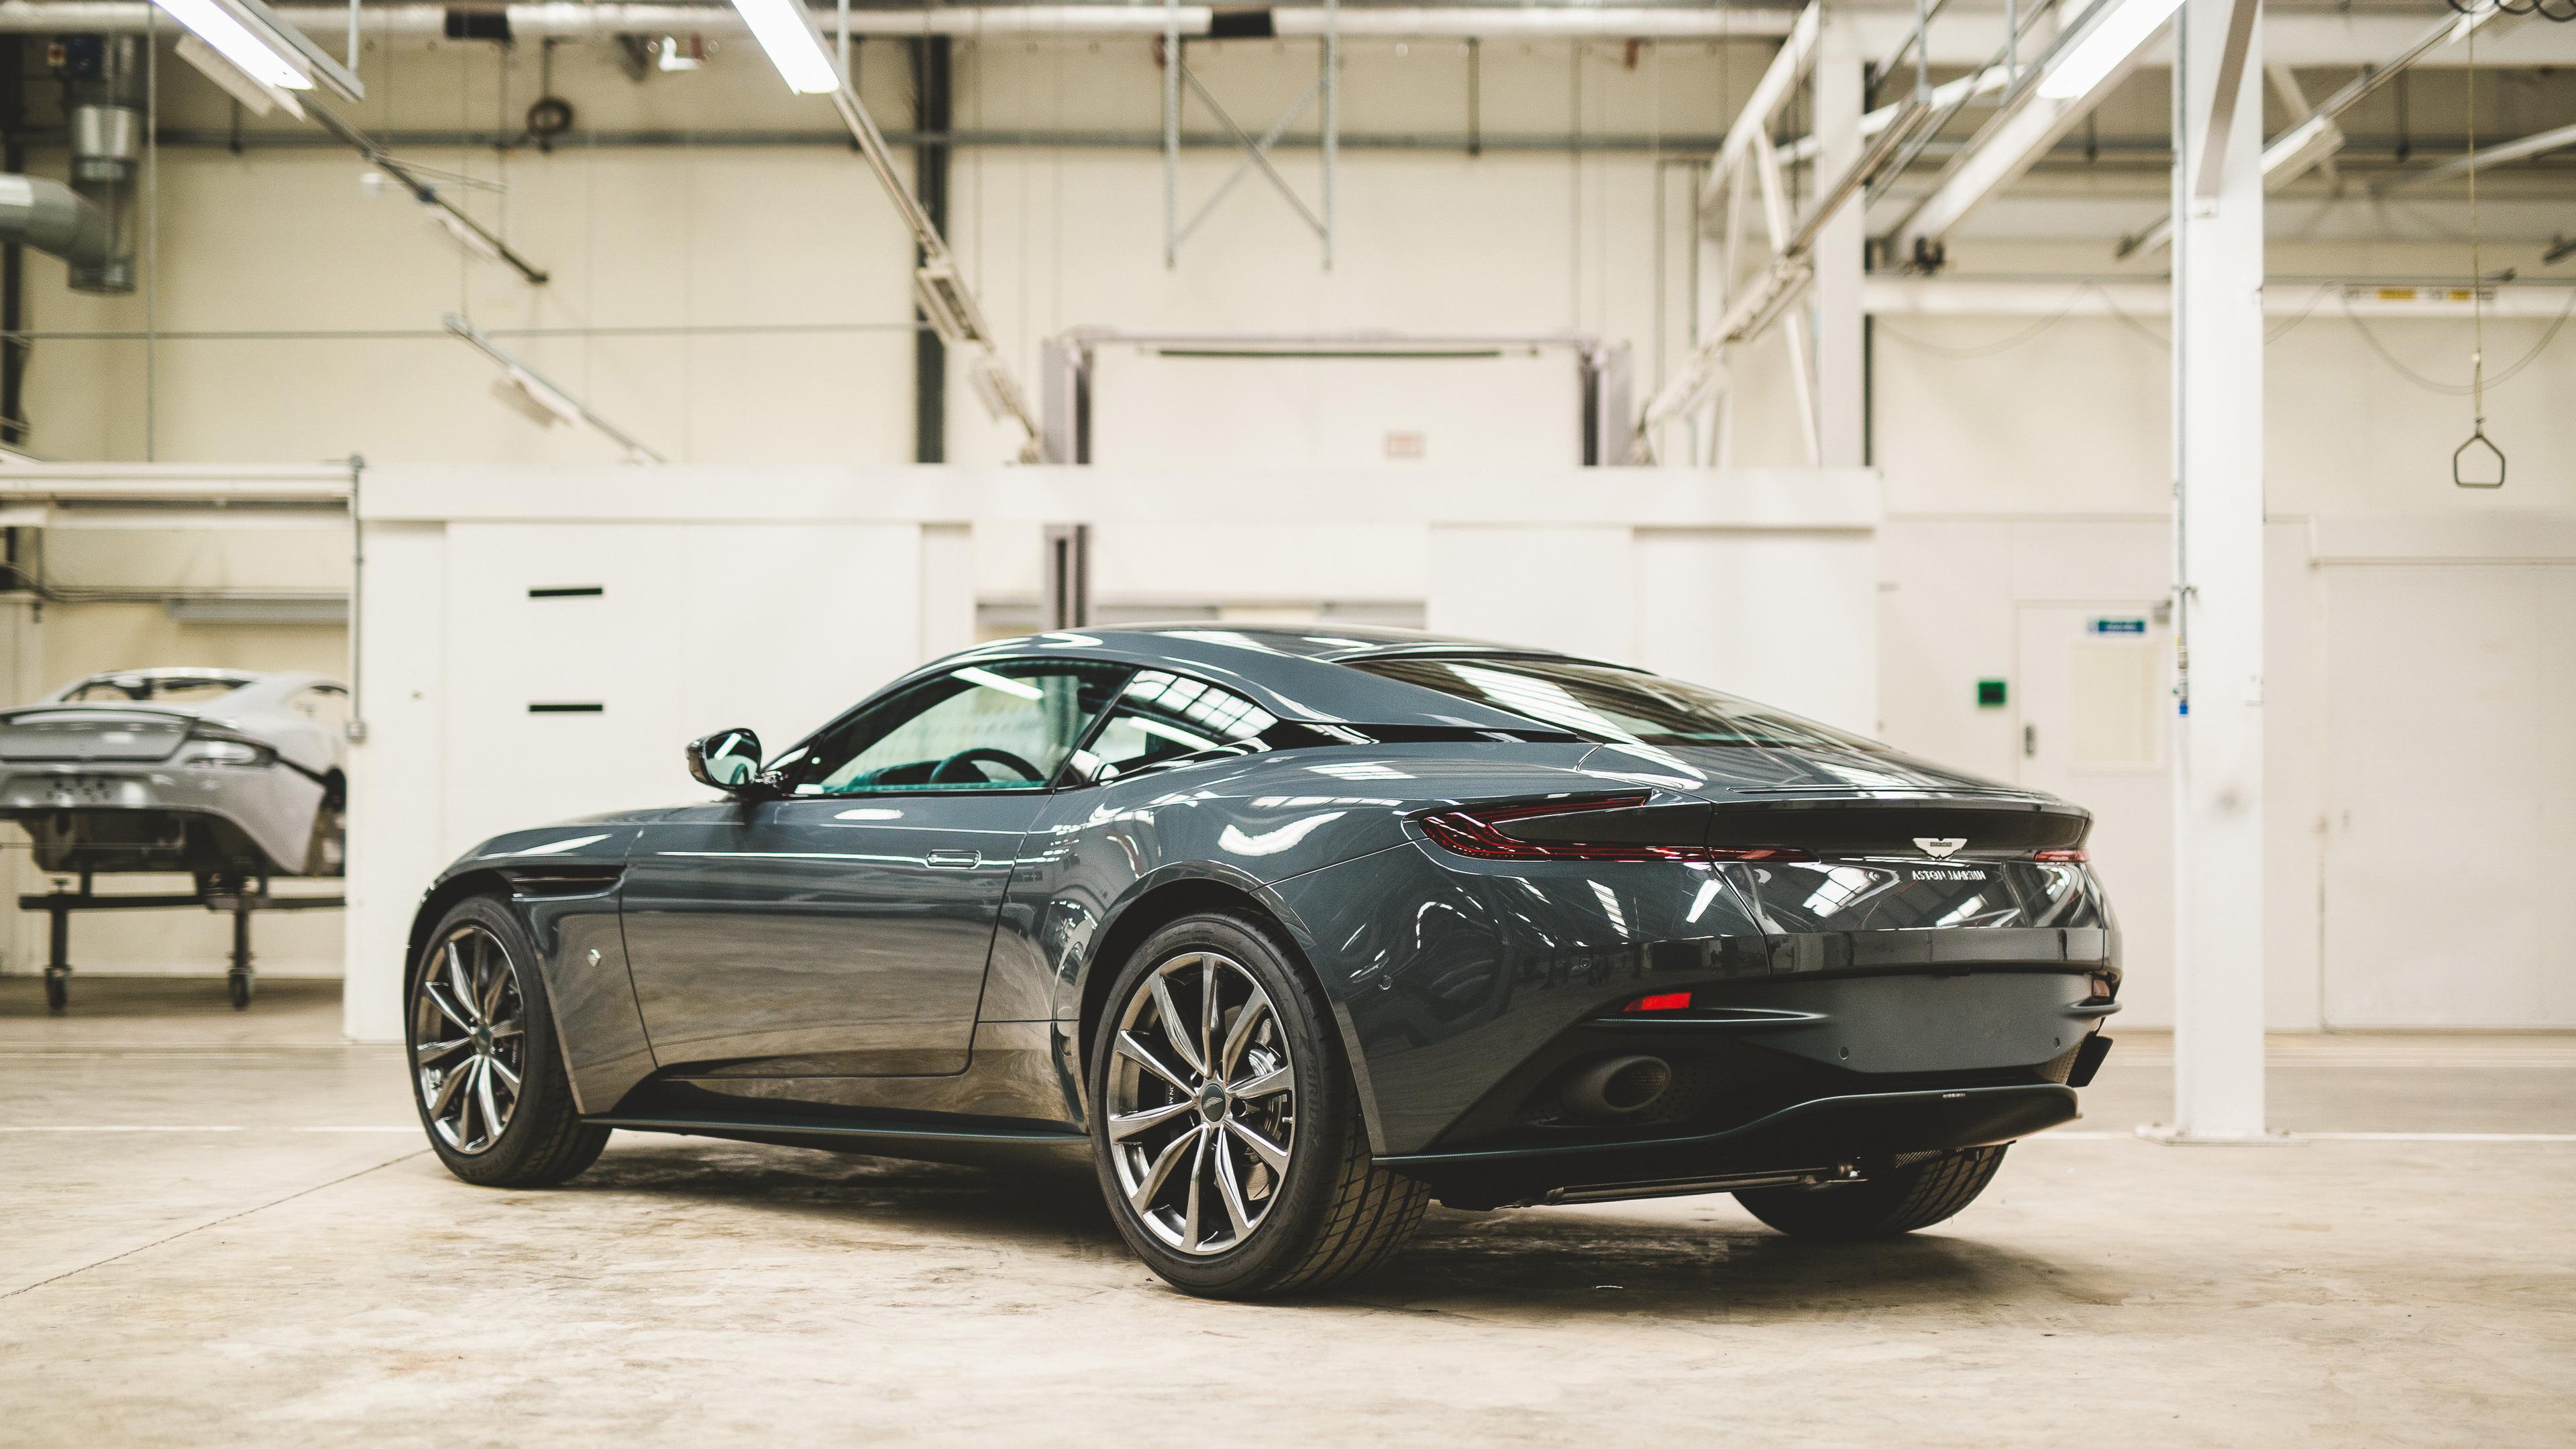 aston martin db11 v8 classic driver edition 2018 rear 1539112237 - Aston Martin DB11 V8 Classic Driver Edition 2018 Rear - hd-wallpapers, cars wallpapers, aston martin wallpapers, aston martin db11 wallpapers, 4k-wallpapers, 2018 cars wallpapers